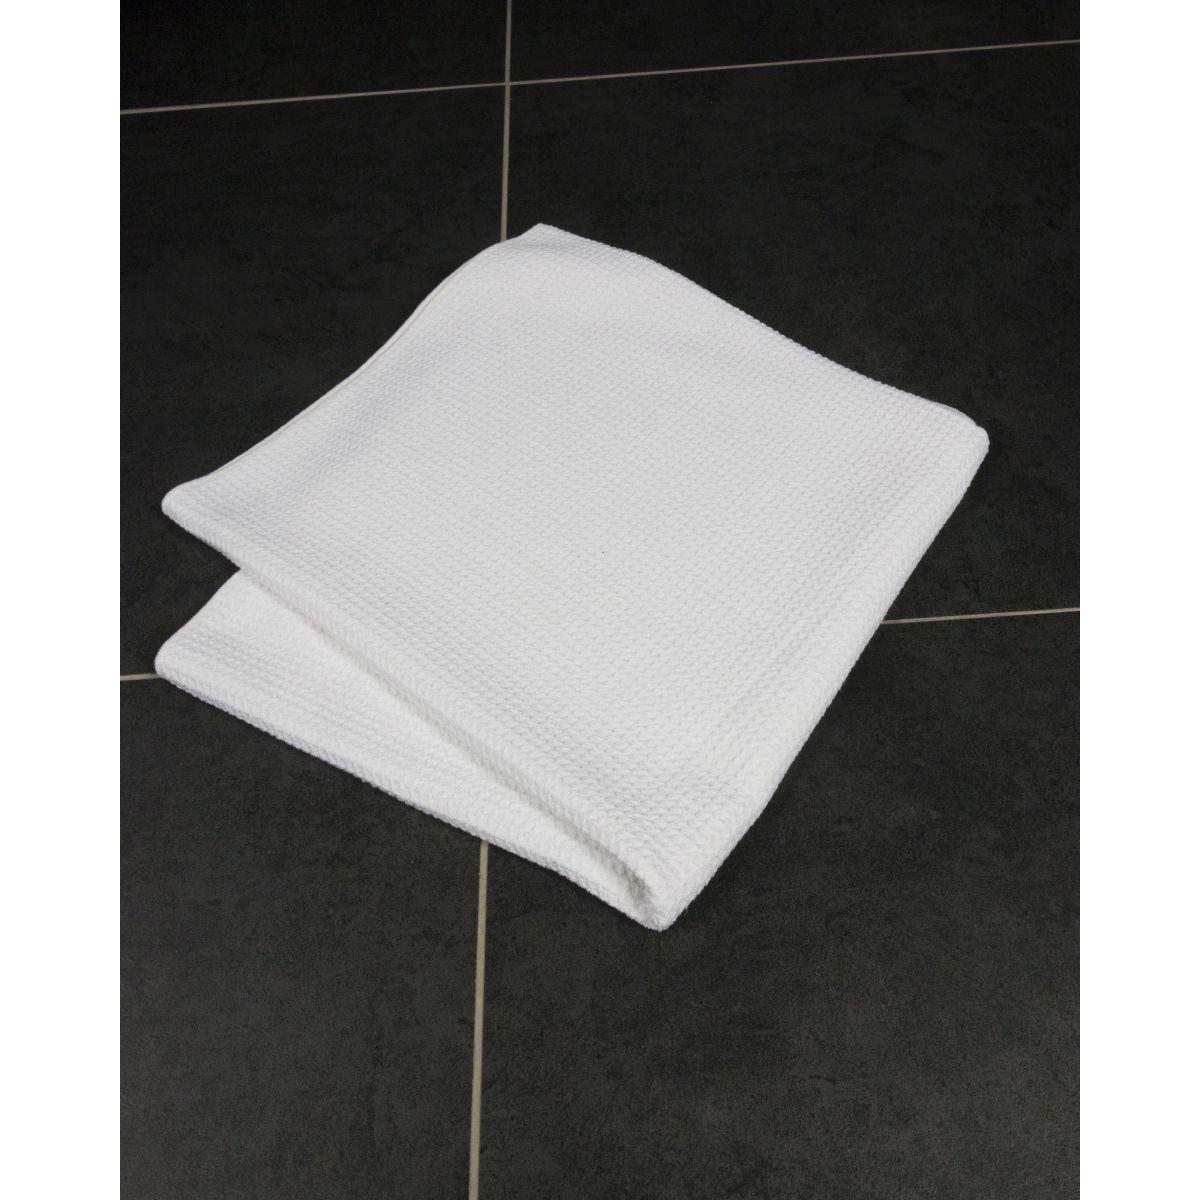 drap de douche blanc en microfibre taimiti espace bain. Black Bedroom Furniture Sets. Home Design Ideas